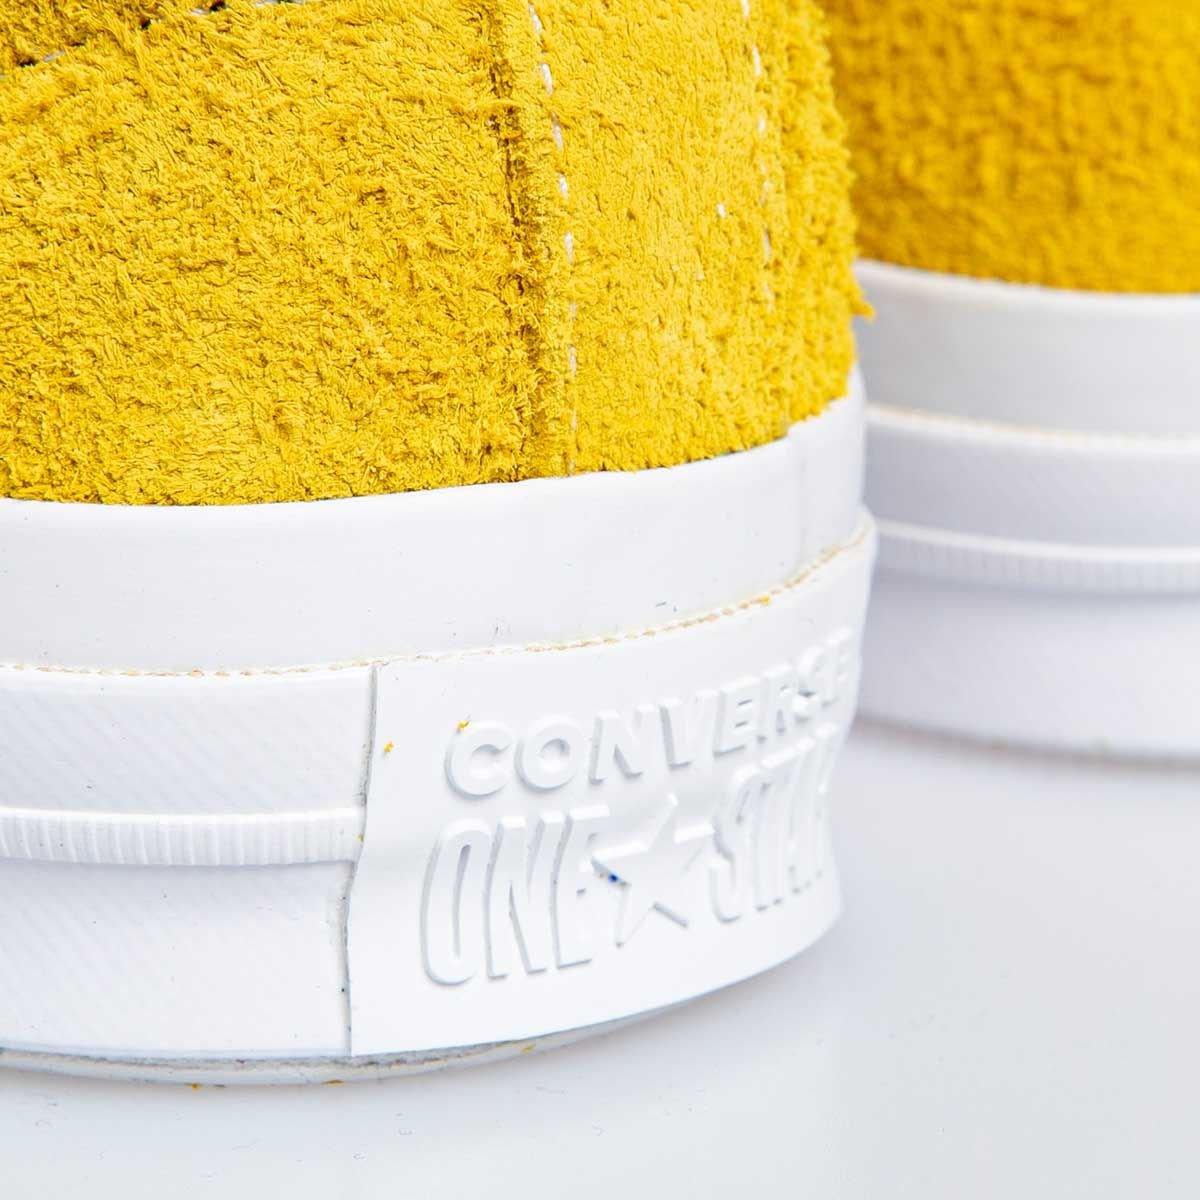 Buty Sneakers Converse One Star OX żółte (166848C)